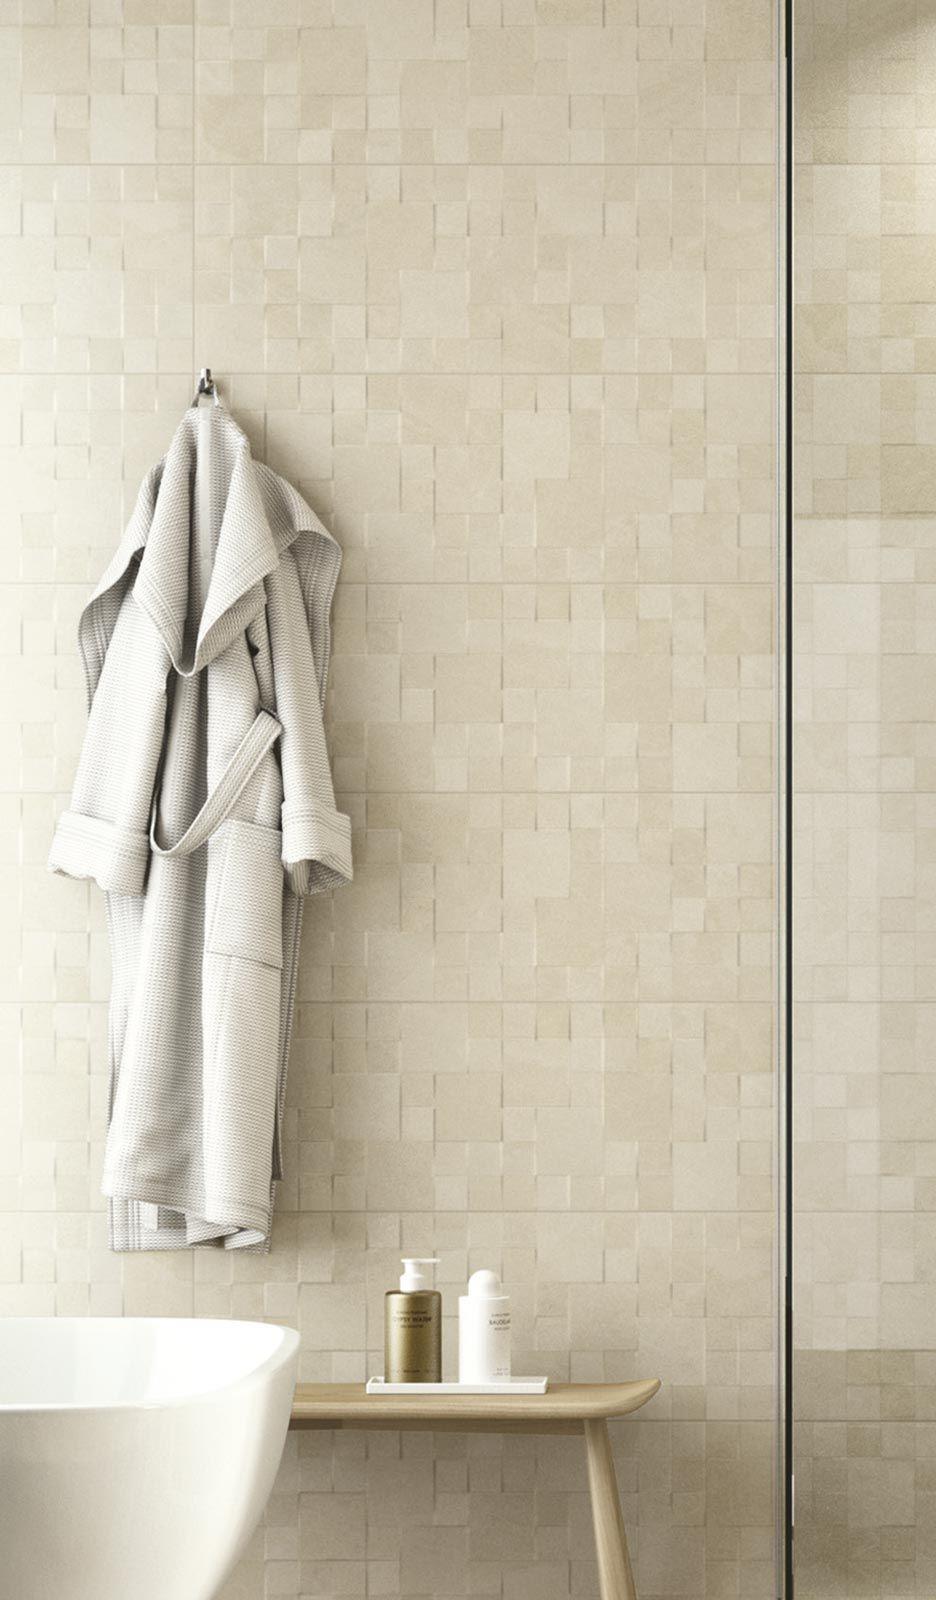 #Ragno #Natural Form Limestone Avorio Quadra 32x89 cm DCSR   #Porcelain stoneware #Stone #32x89   on #bathroom39.com at 43 Euro/sqm   #tiles #ceramic #floor #bathroom #kitchen #outdoor